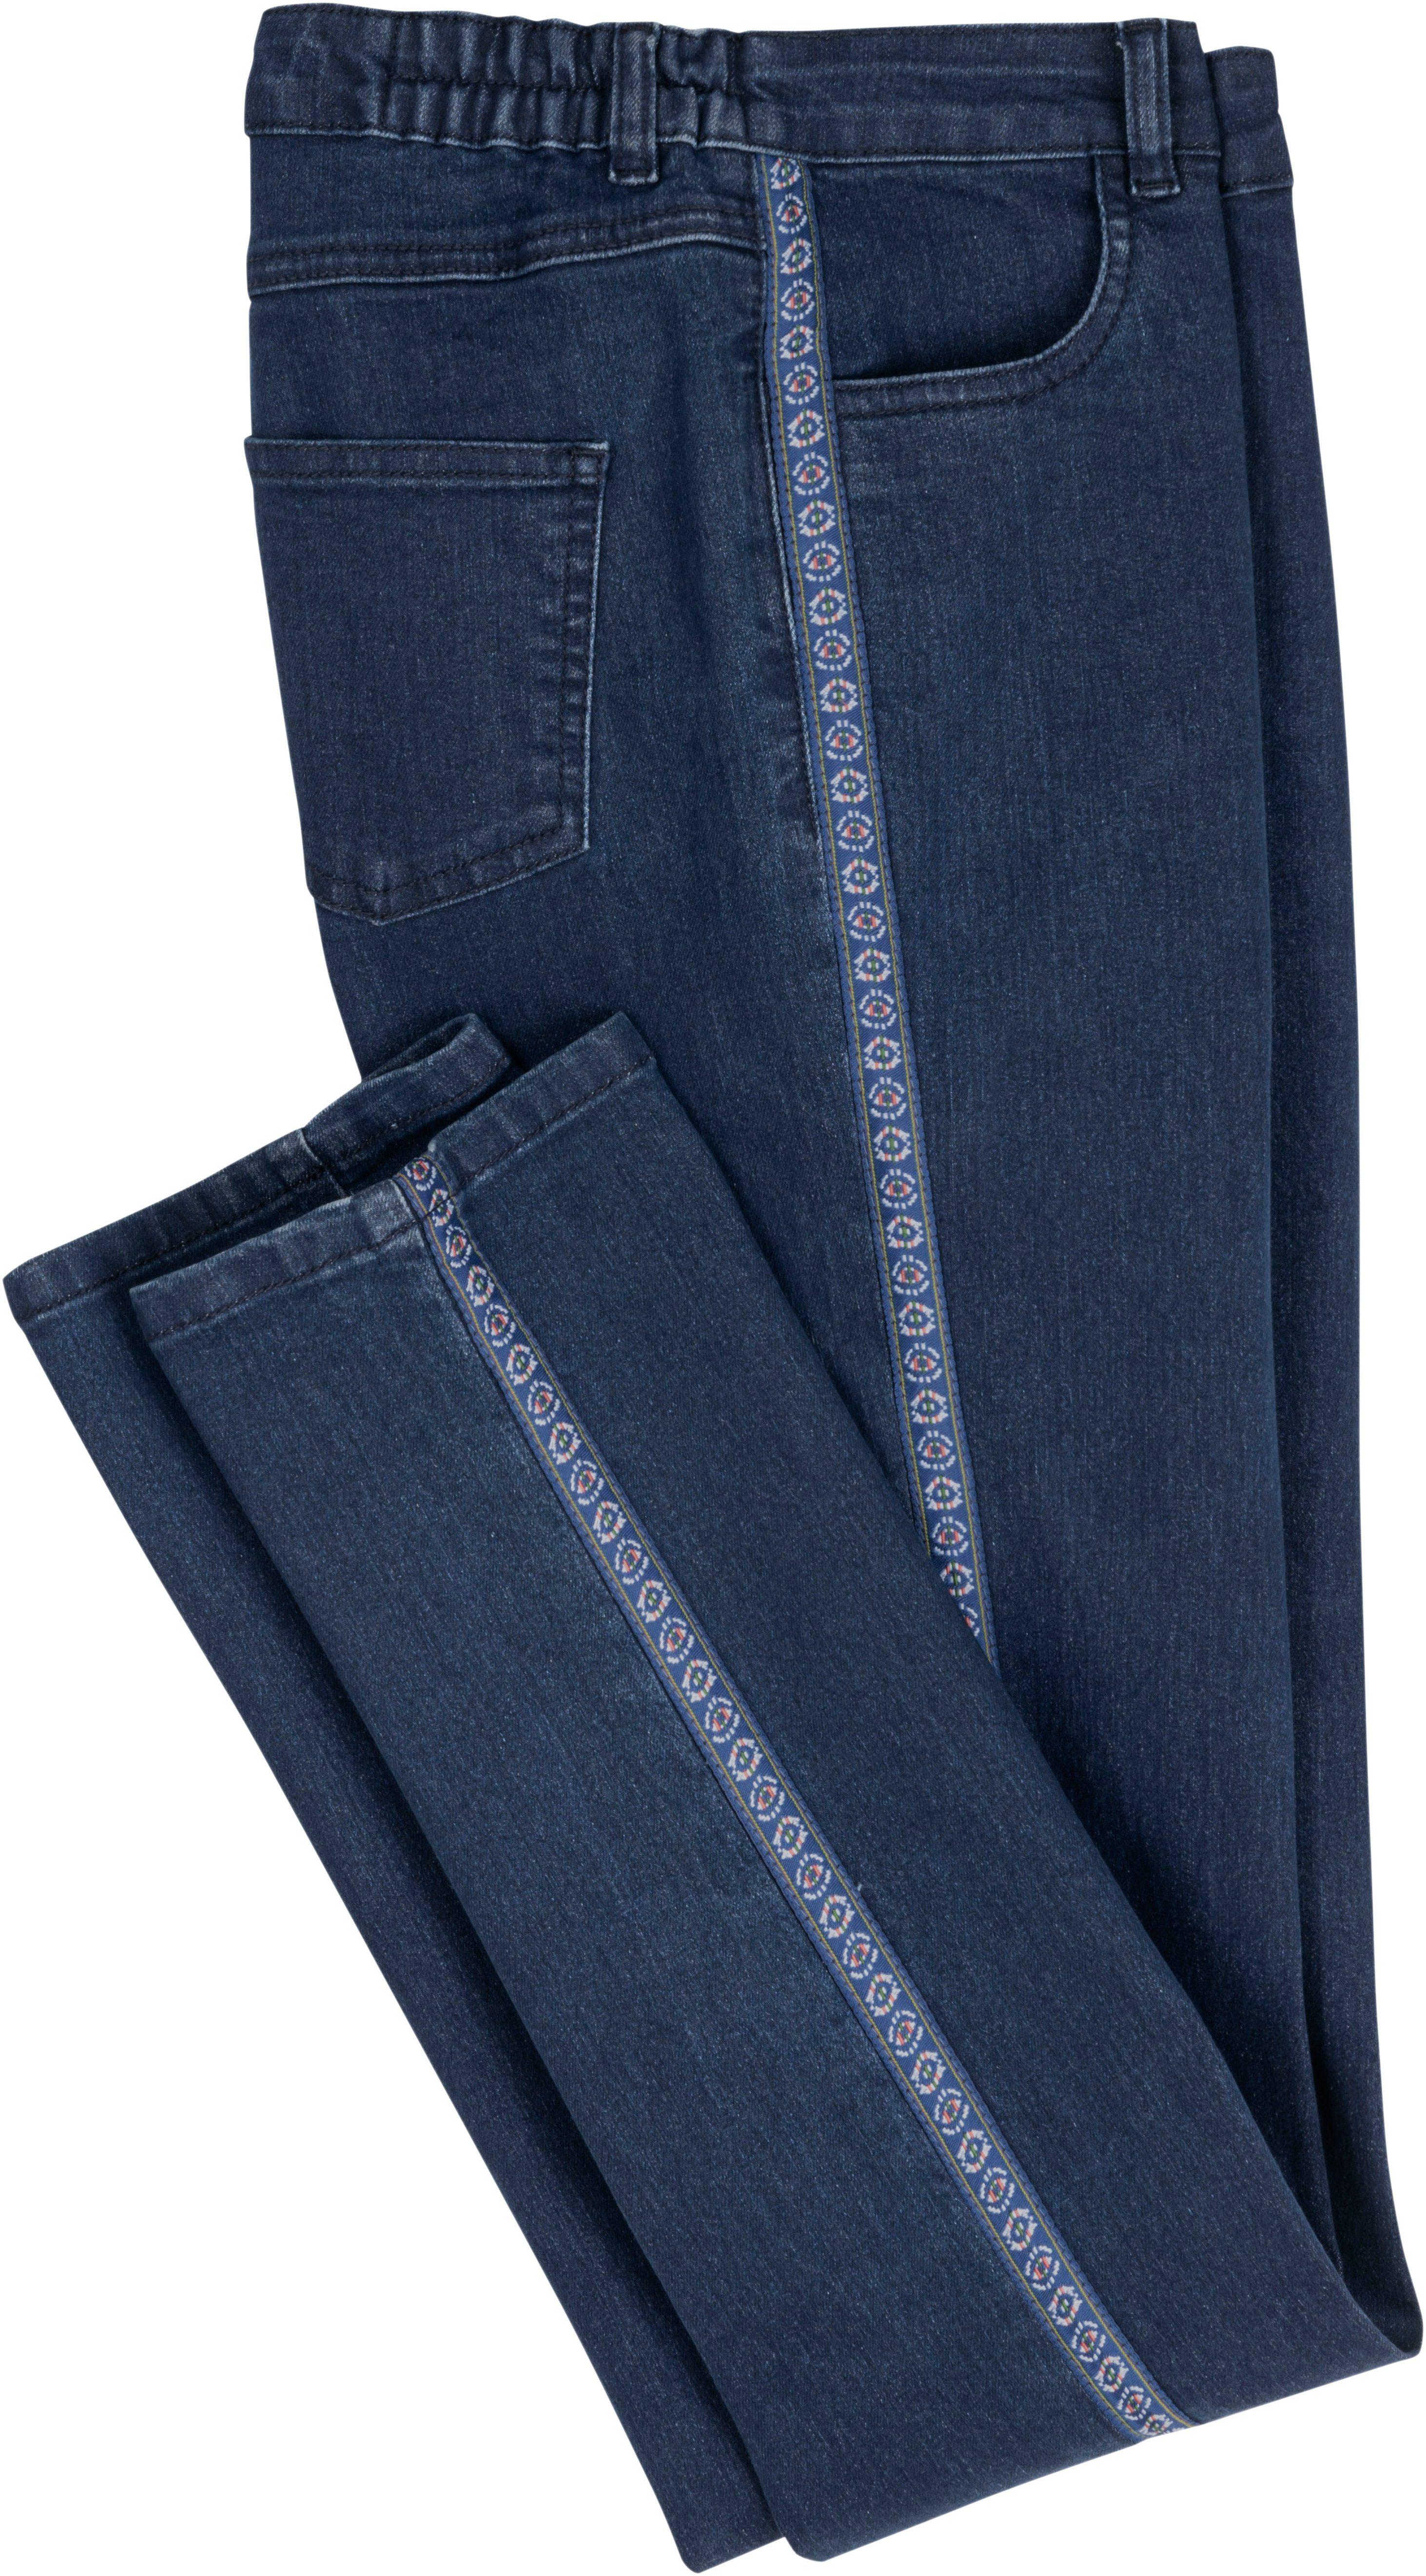 Classic Basics Stretch Jeans Makkelijk Gekocht - Geweldige Prijs